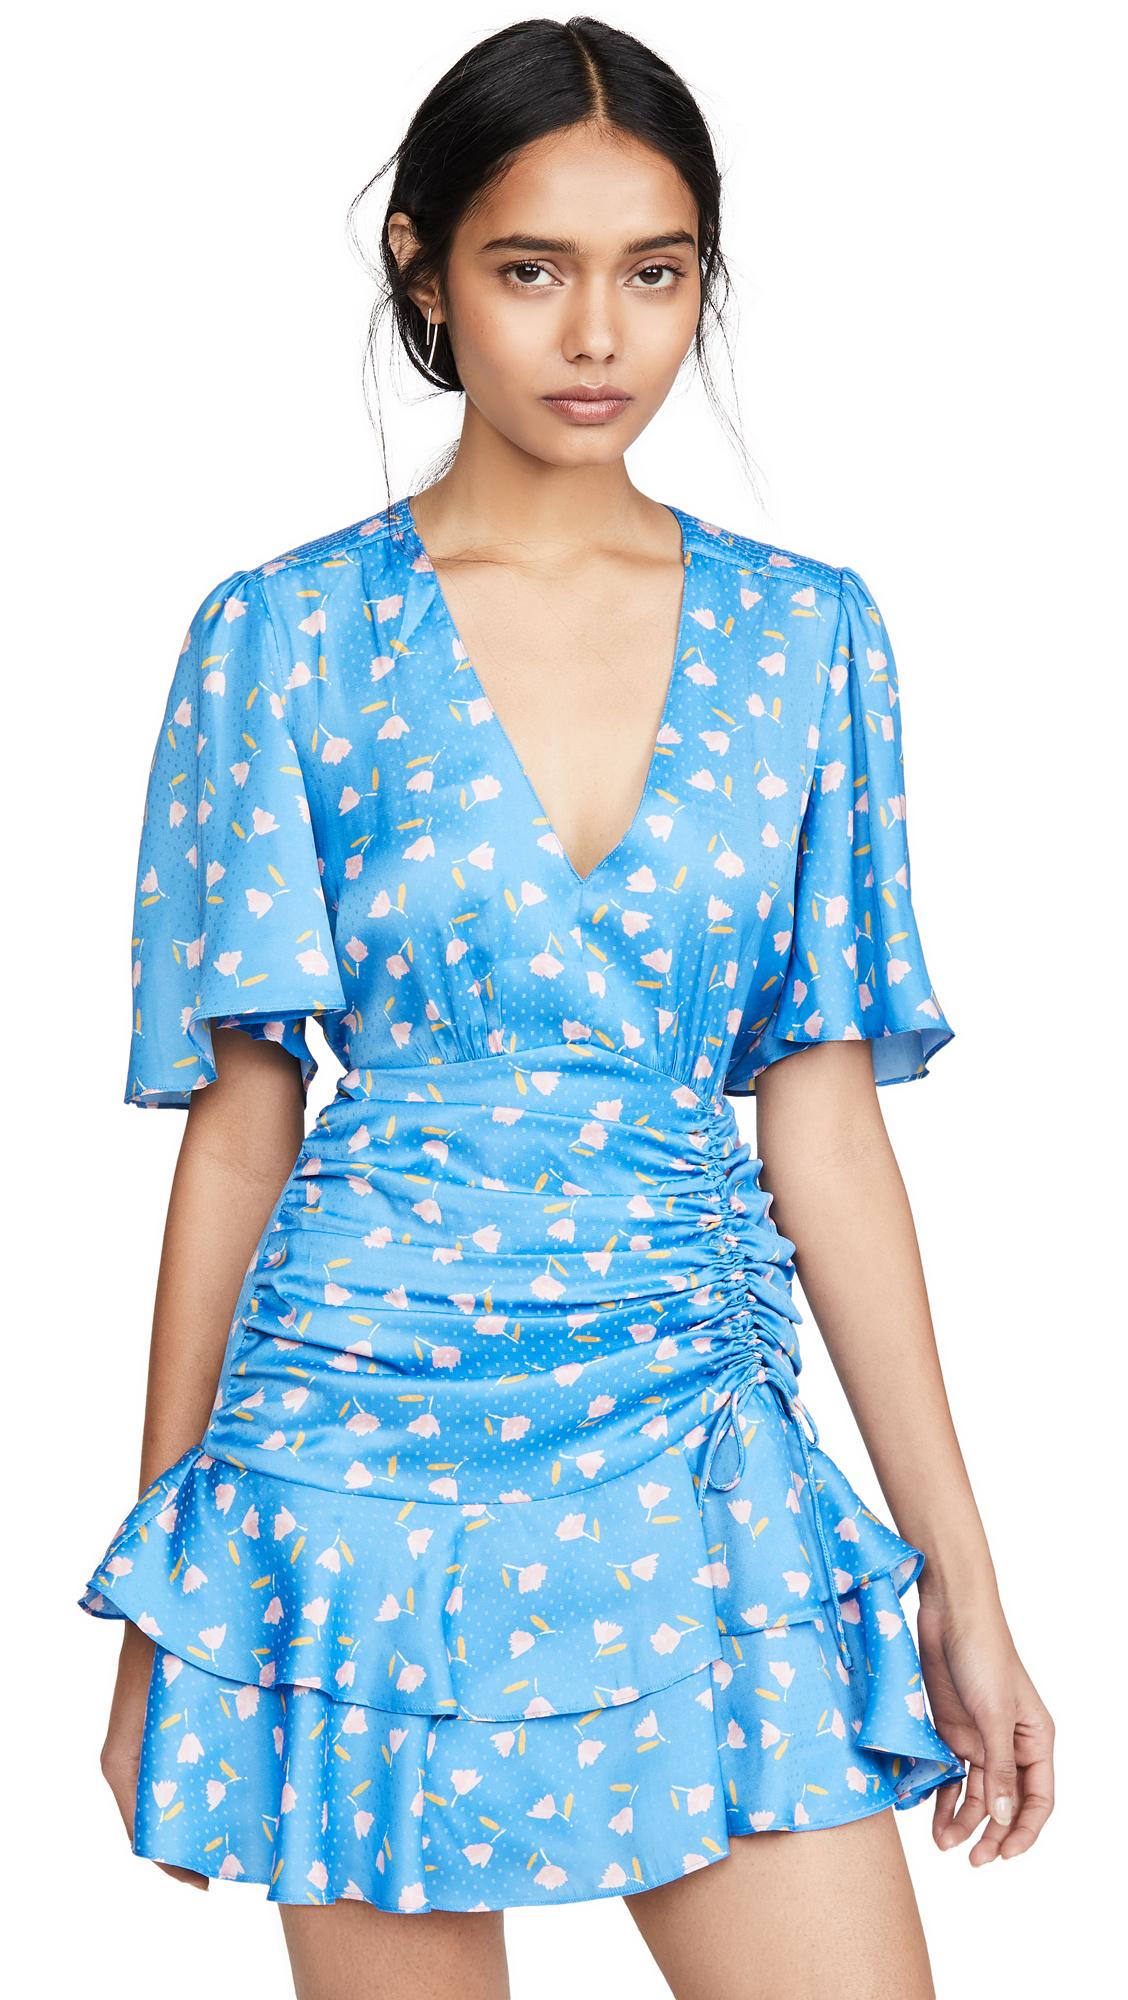 Saylor Mel Mini Dress - 40% Off Sale